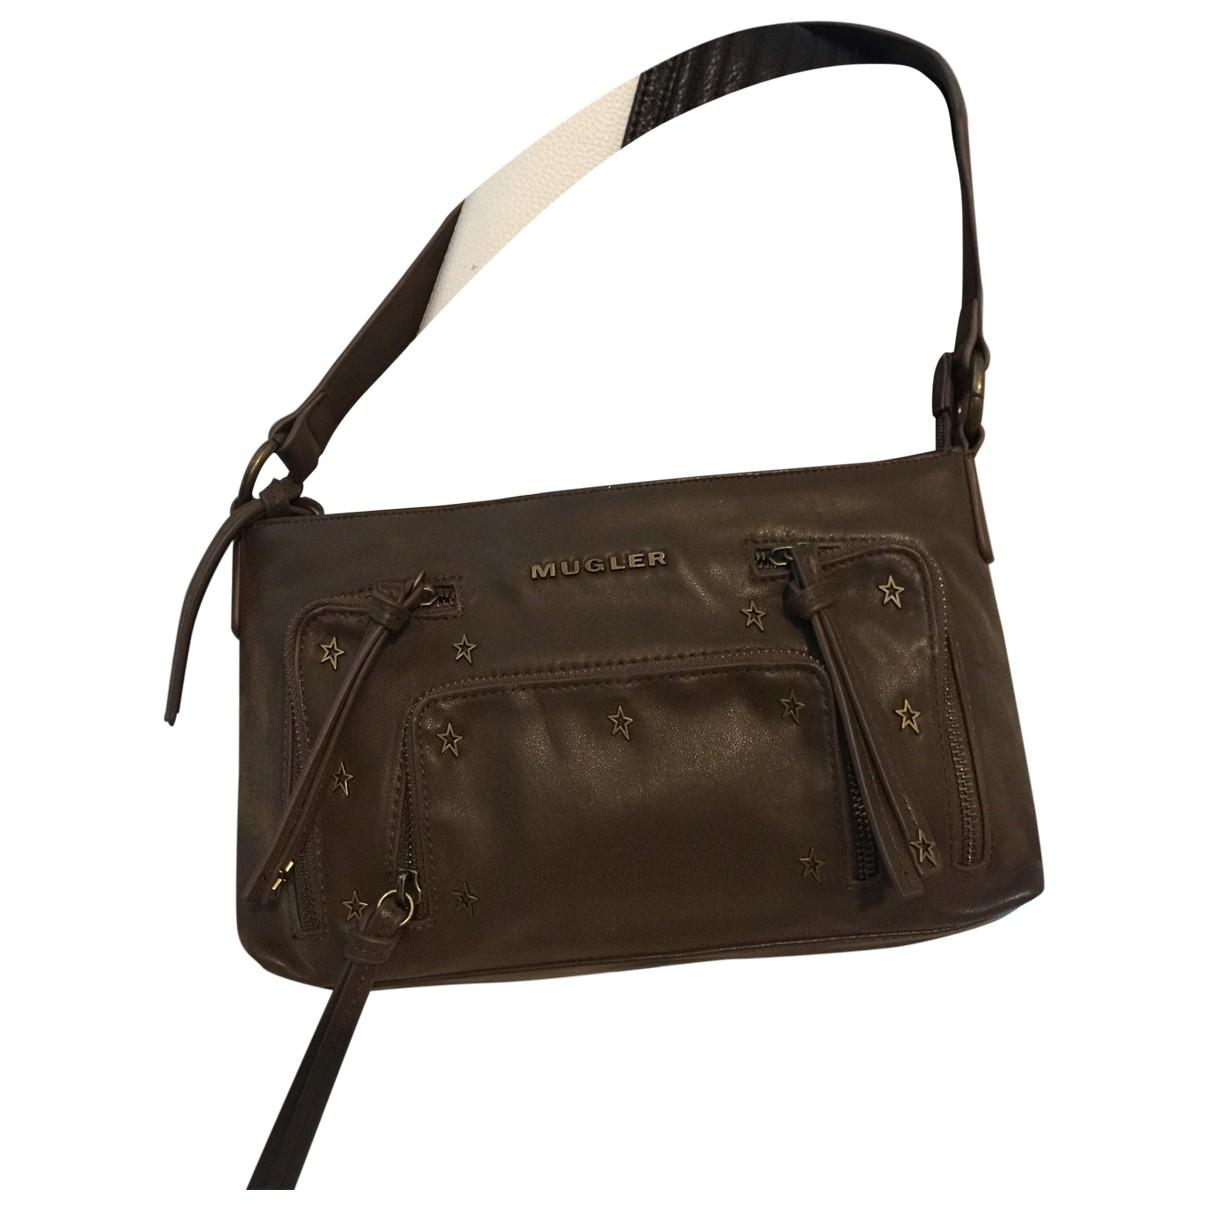 Mugler \N Brown Leather handbag for Women \N